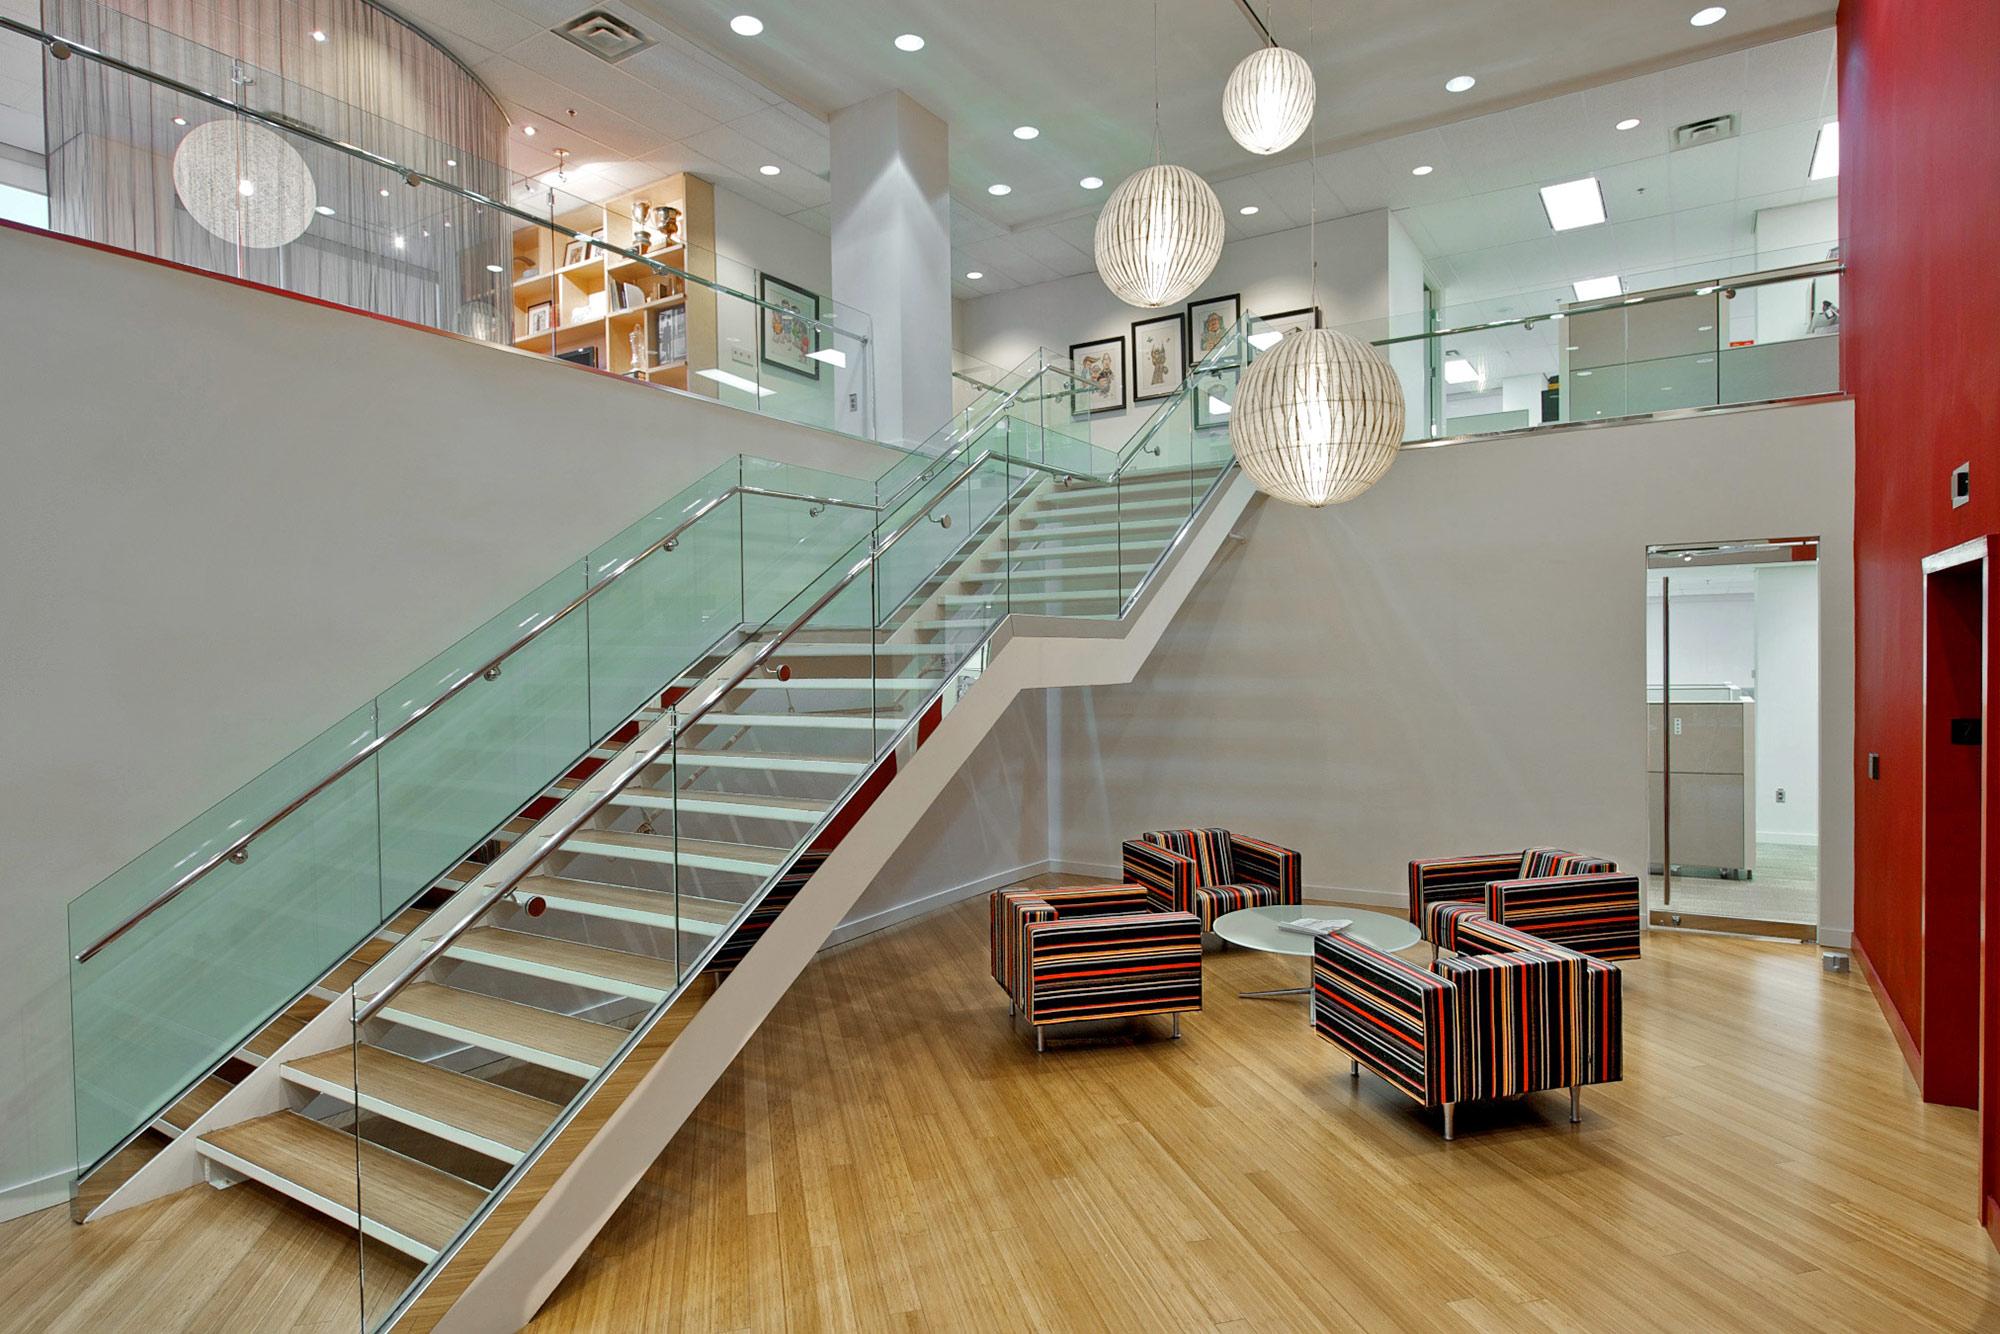 interior-design-media-office-stairs-entry.jpg